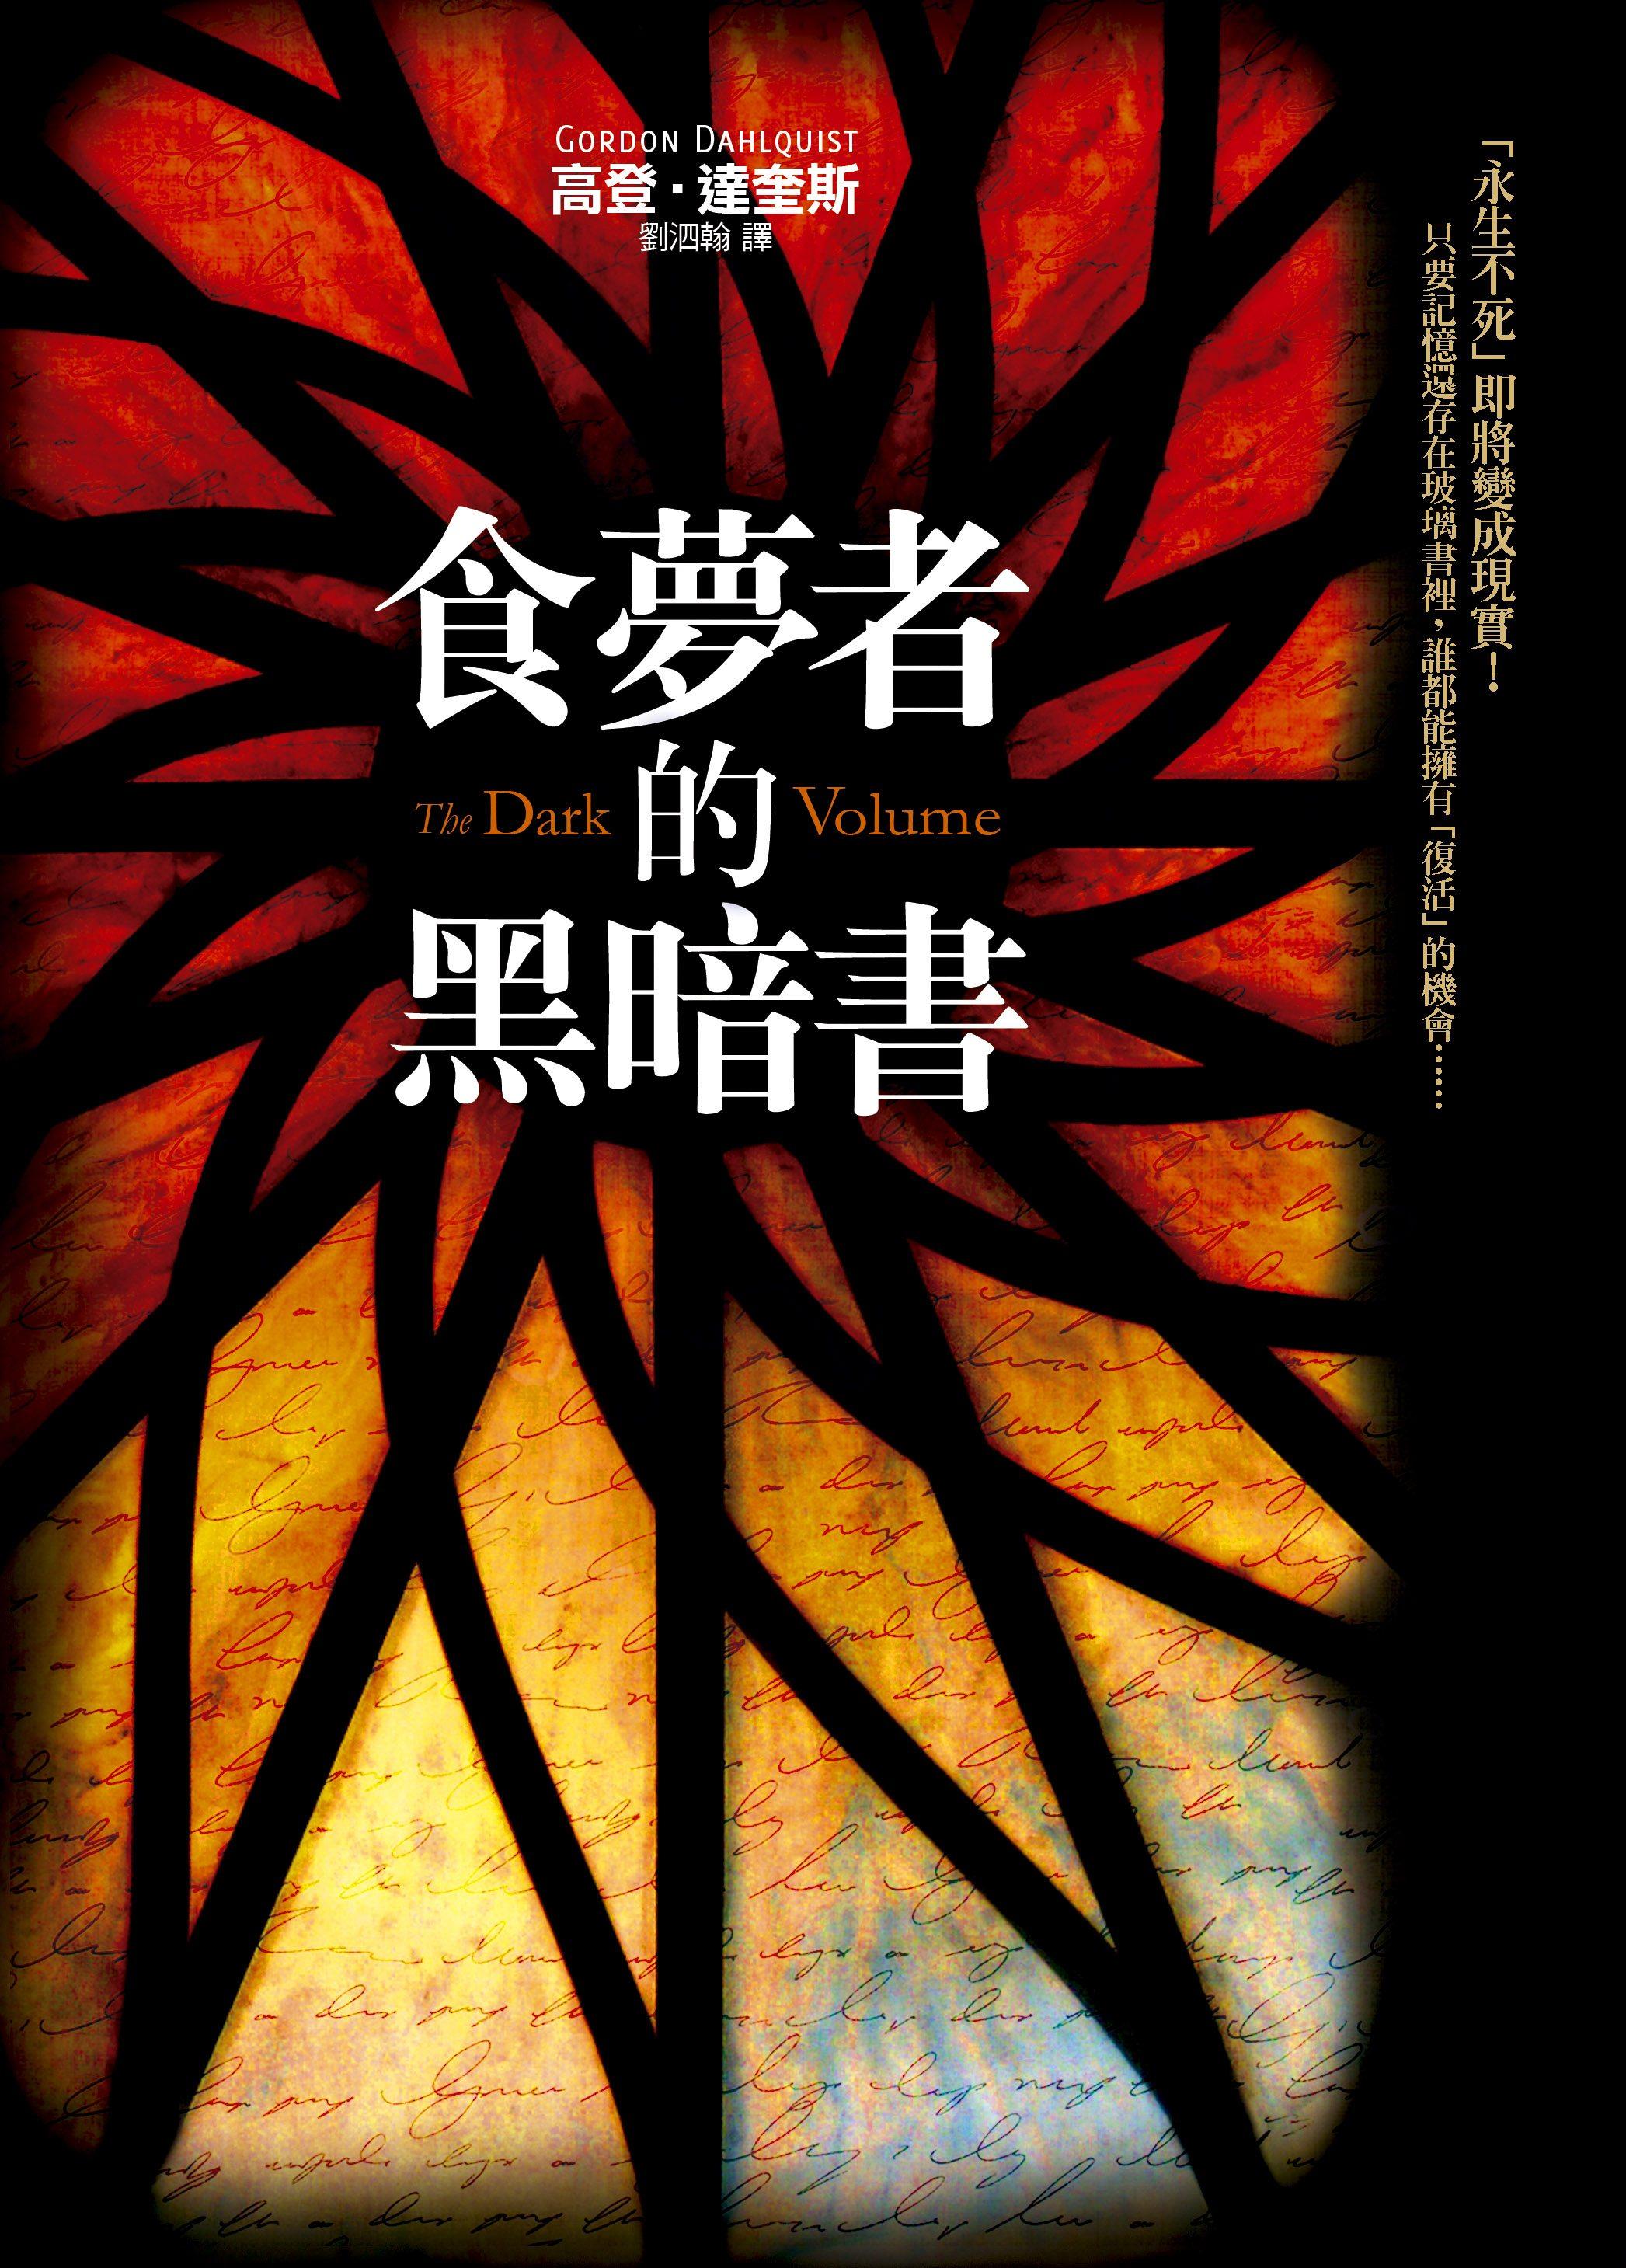 食夢者的黑暗書.jpg